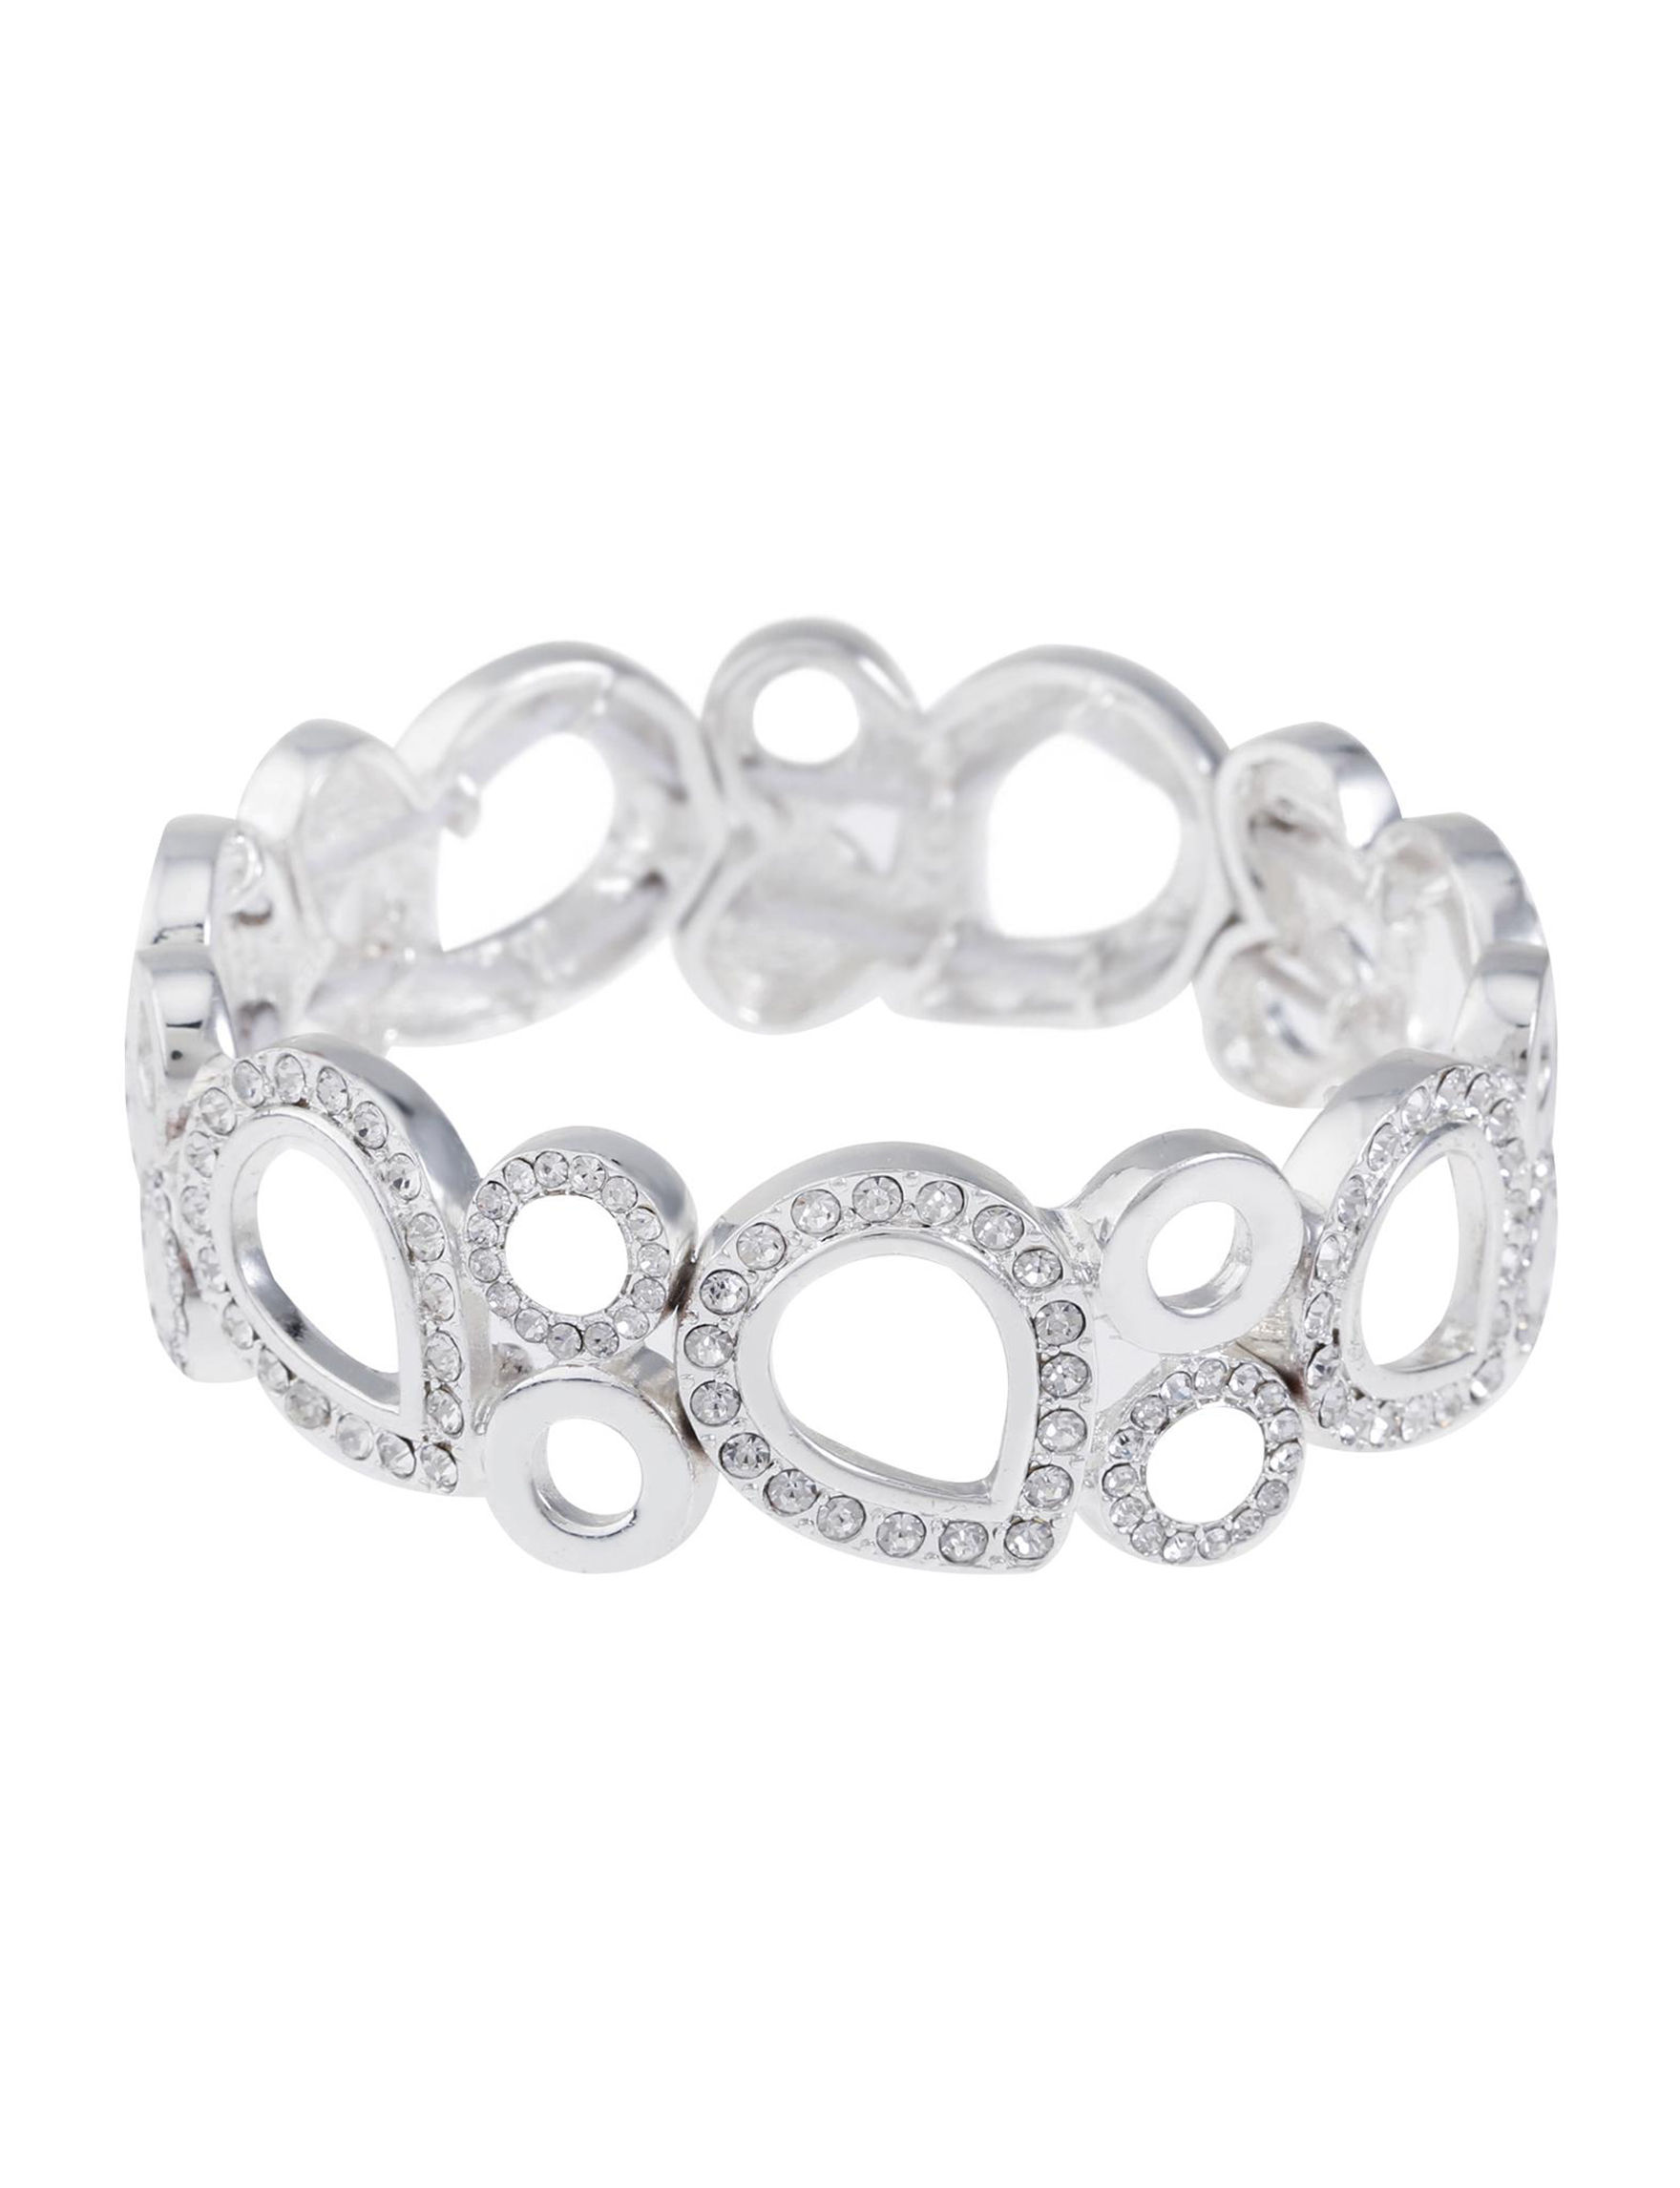 Gloria Vanderbilt Silver Bracelets Fashion Jewelry